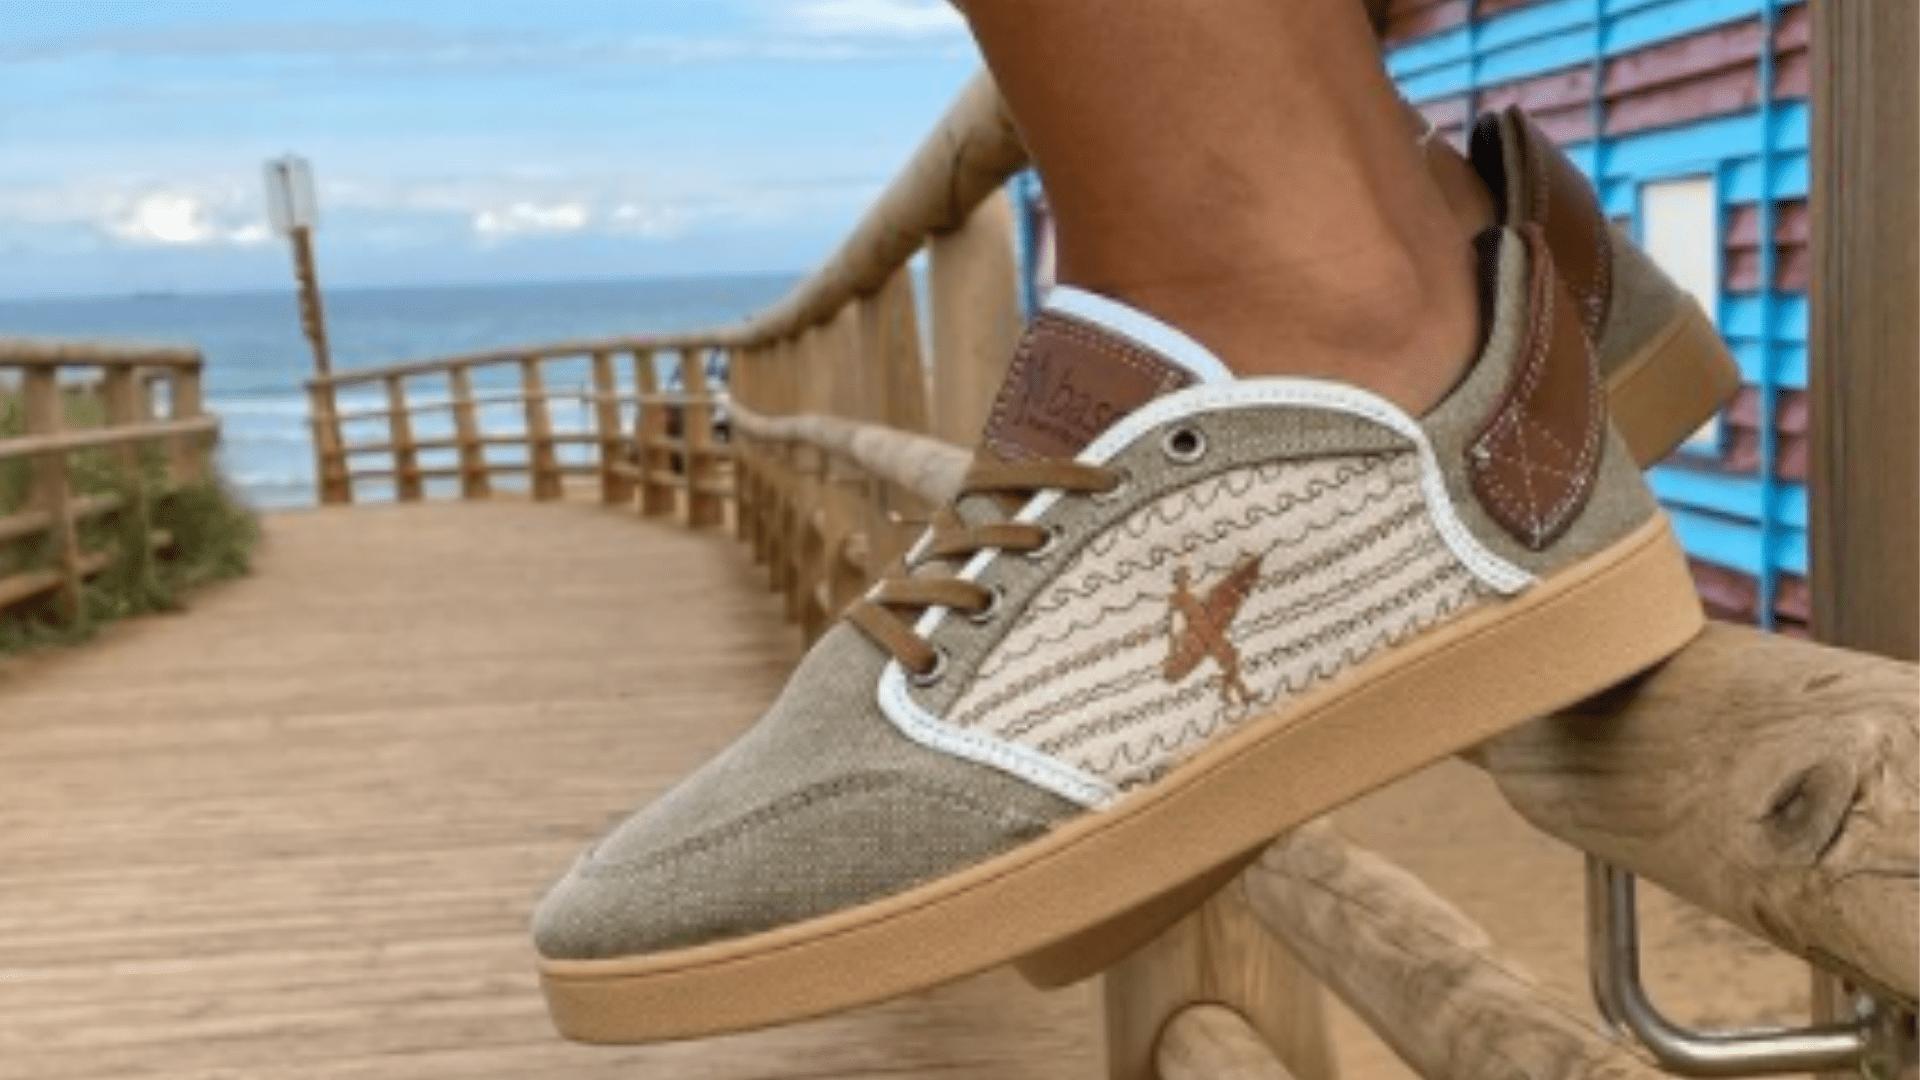 Basq, zapatillas eco made in Spain